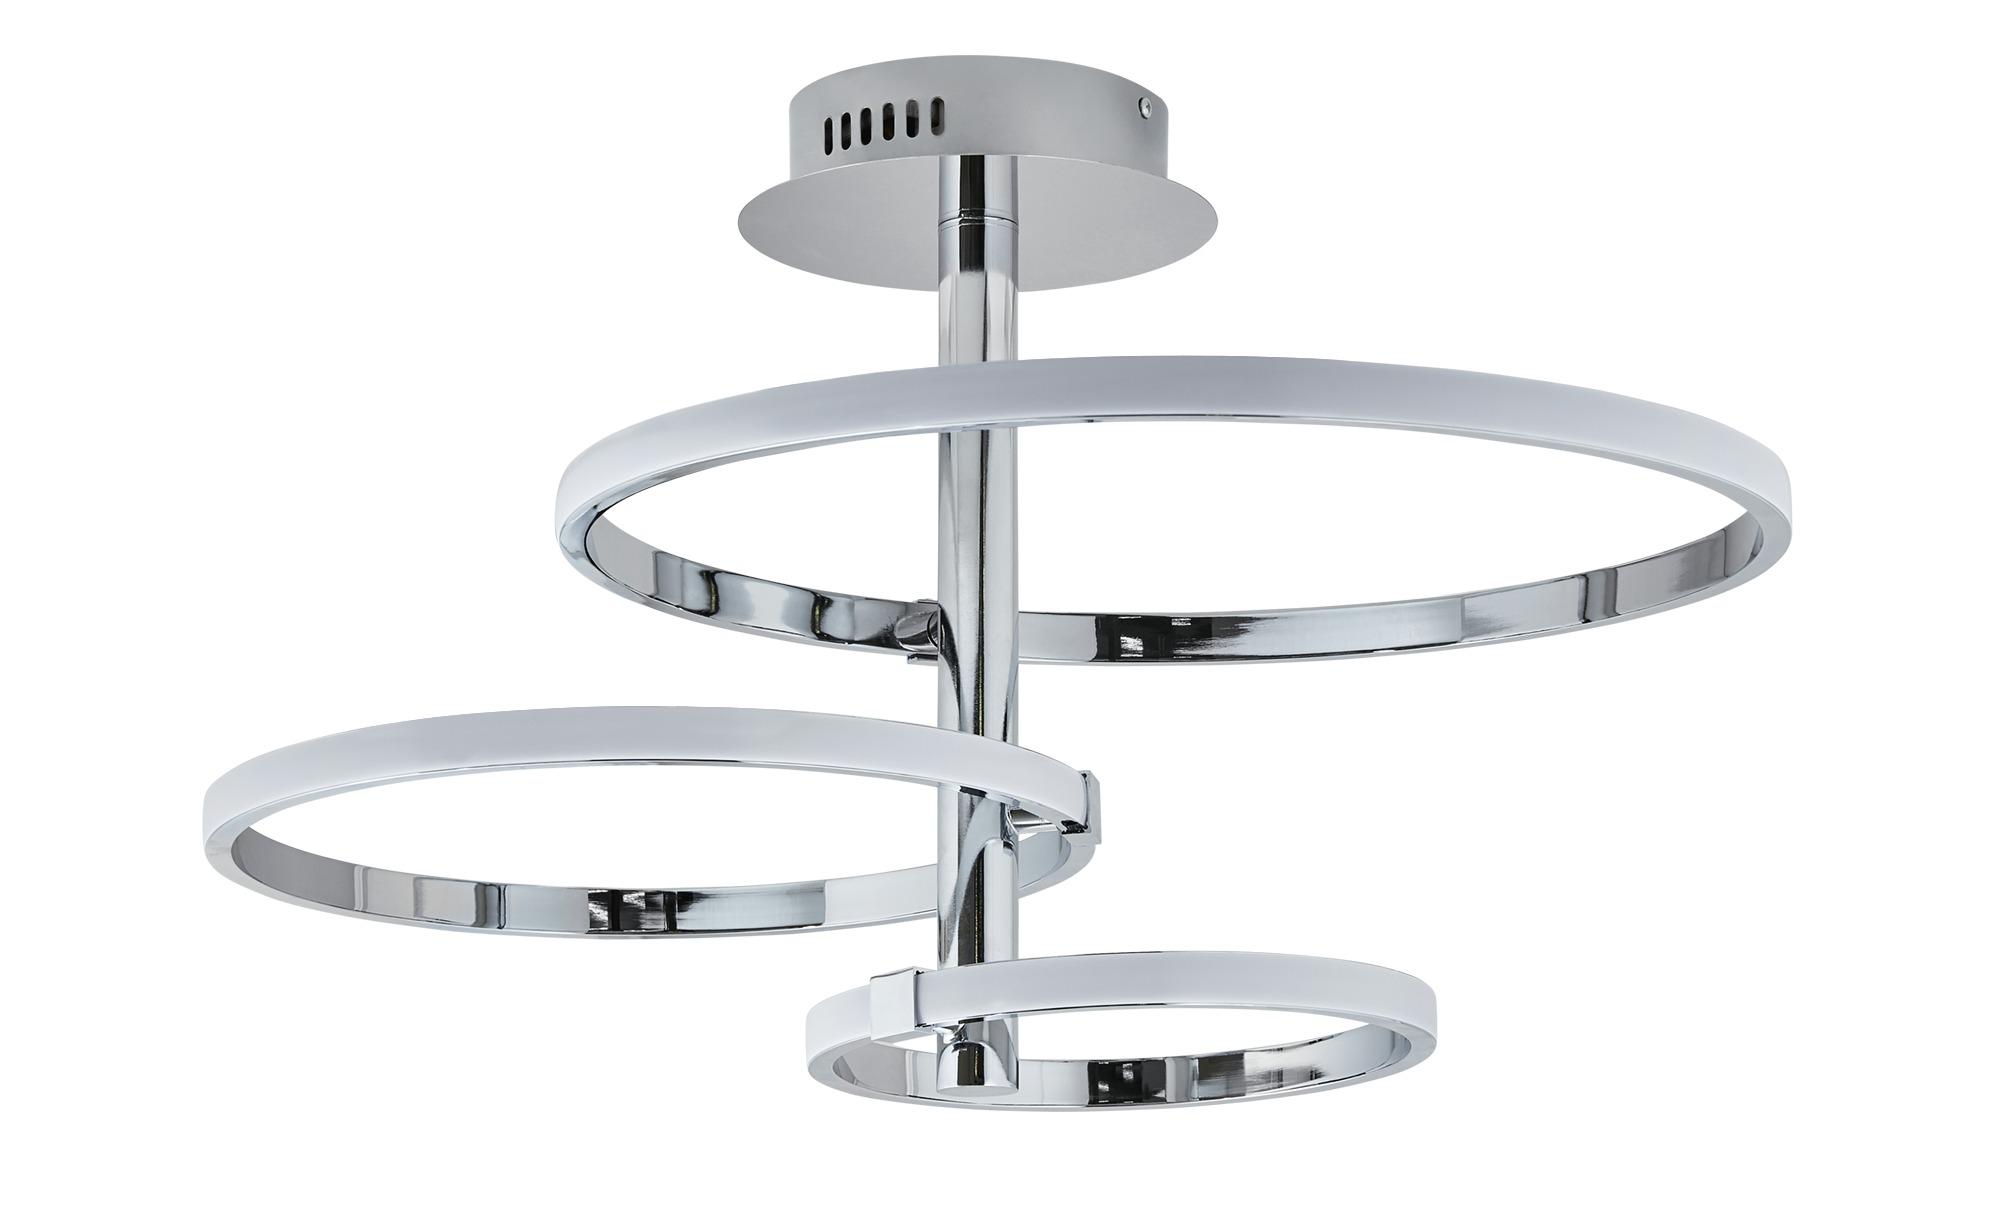 KHG LED-Deckenleuchte, Ringe ¦ silber ¦ Maße (cm): B: 57 H: 40 Ø: 57 Lampen & Leuchten > Innenleuchten > Deckenleuchten - Höffner